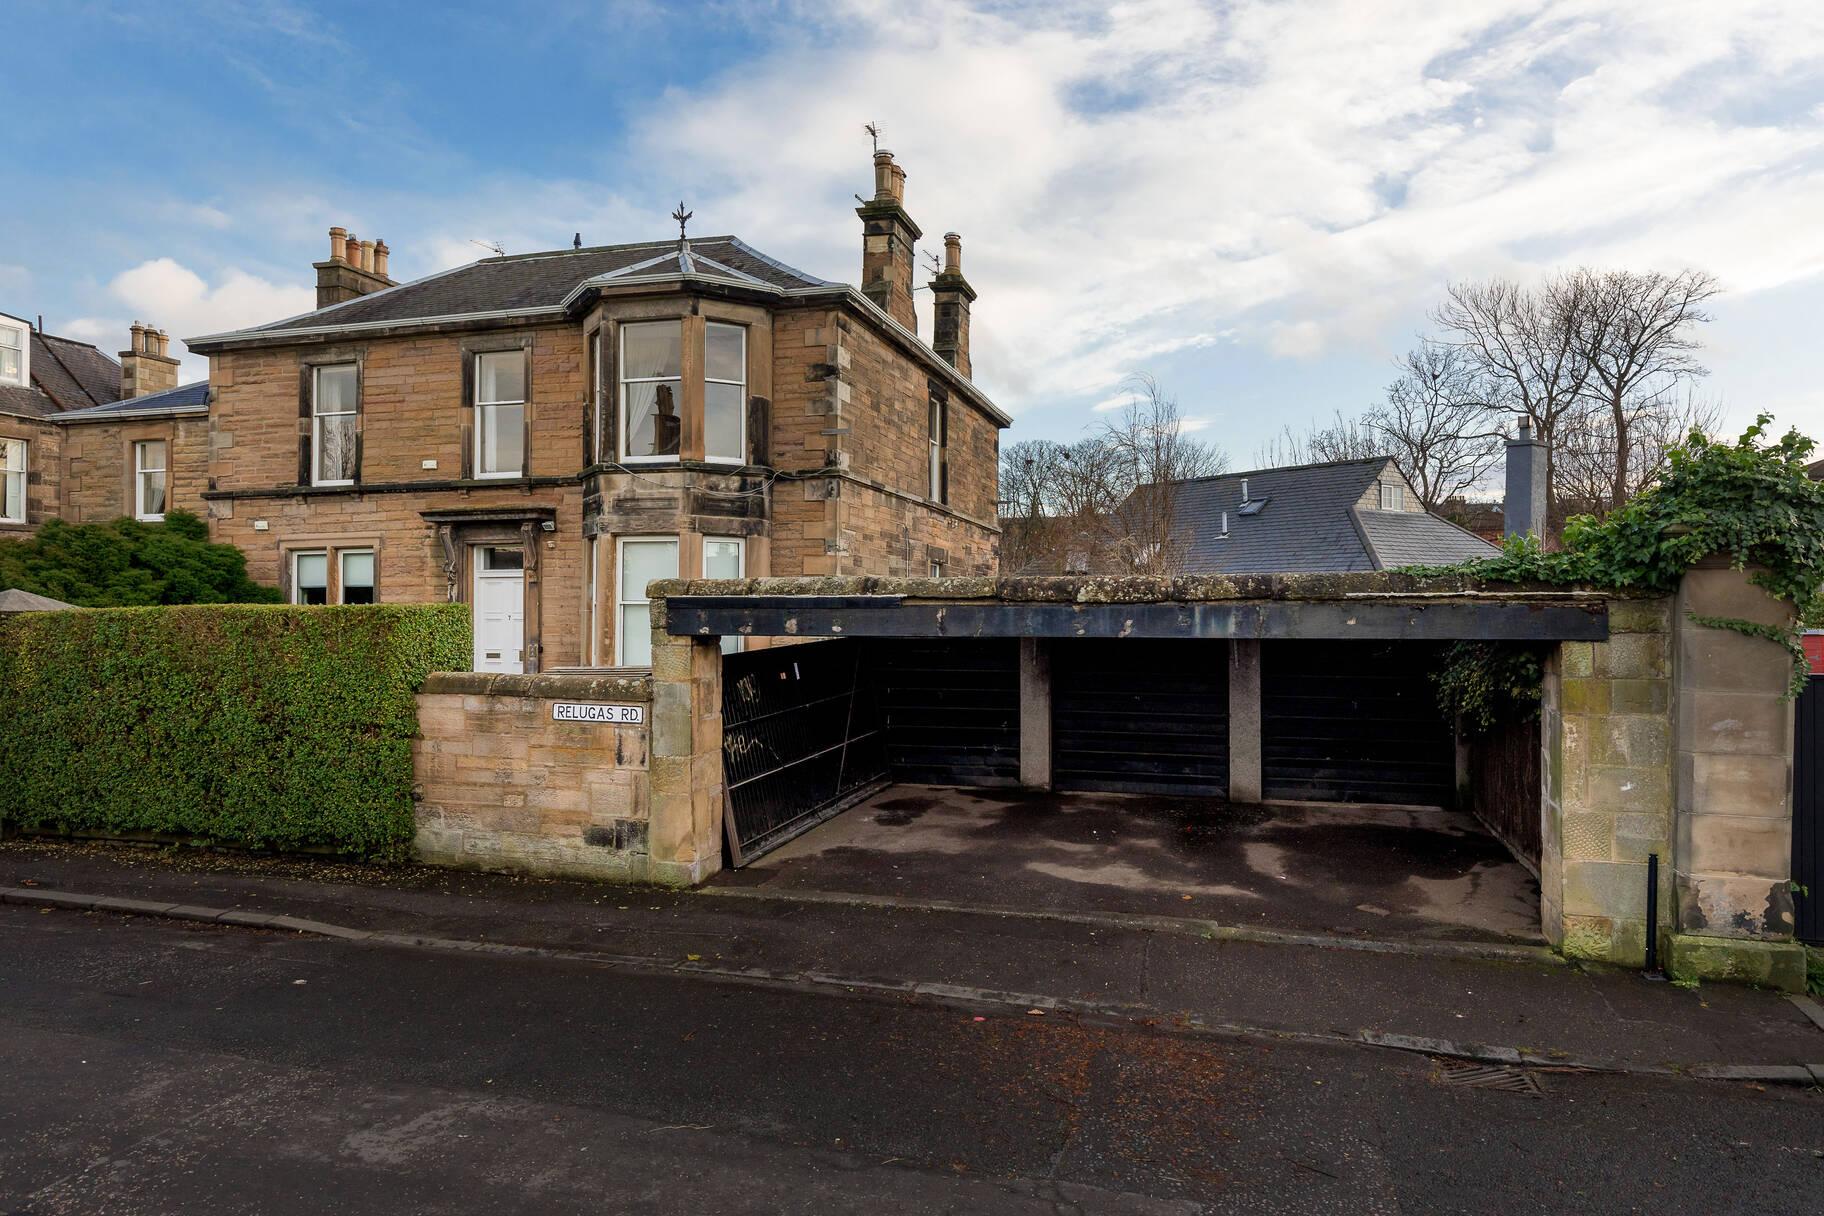 7/2 Relugas Road, The Grange, Edinburgh, EH9 2NE